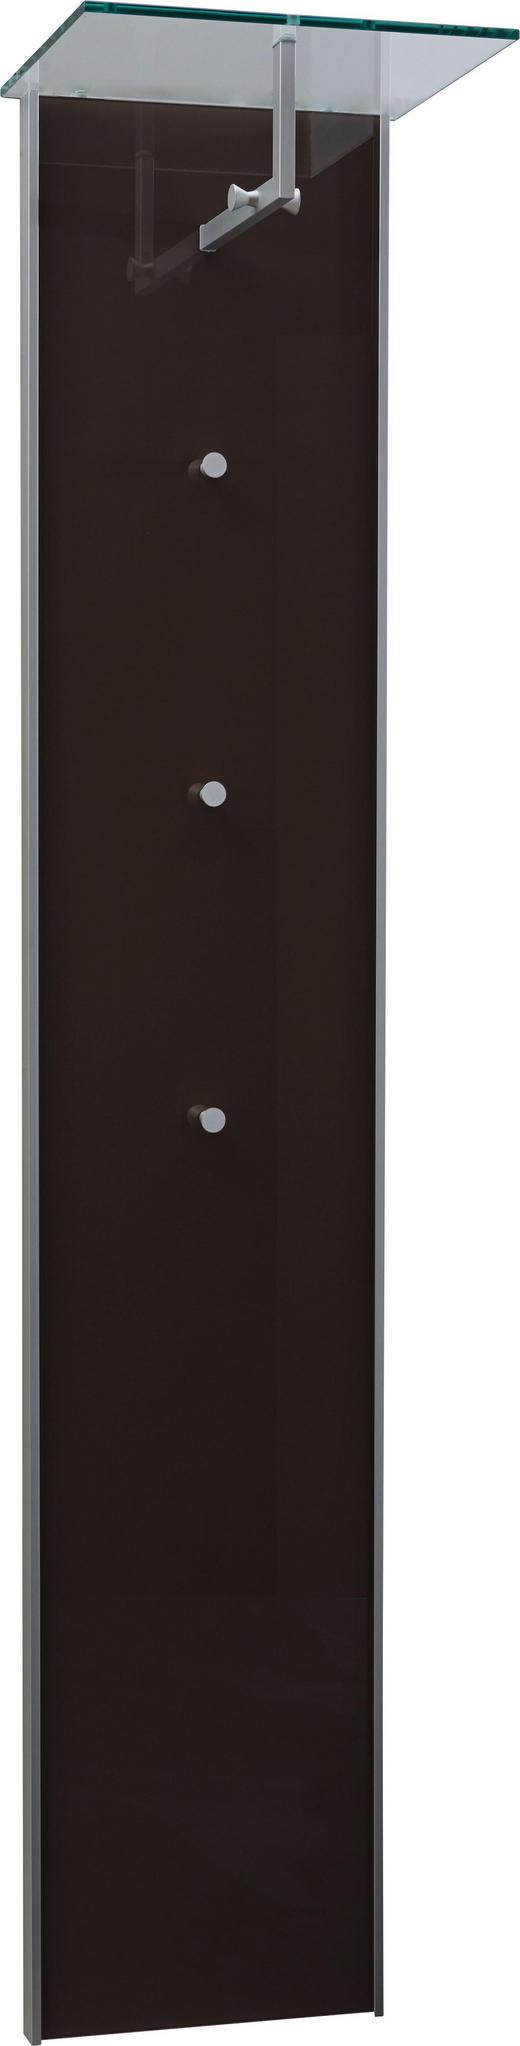 GARDEROBENPANEEL - Klar/Alufarben, Design, Glas/Holzwerkstoff (40/189/32,5cm) - Dieter Knoll